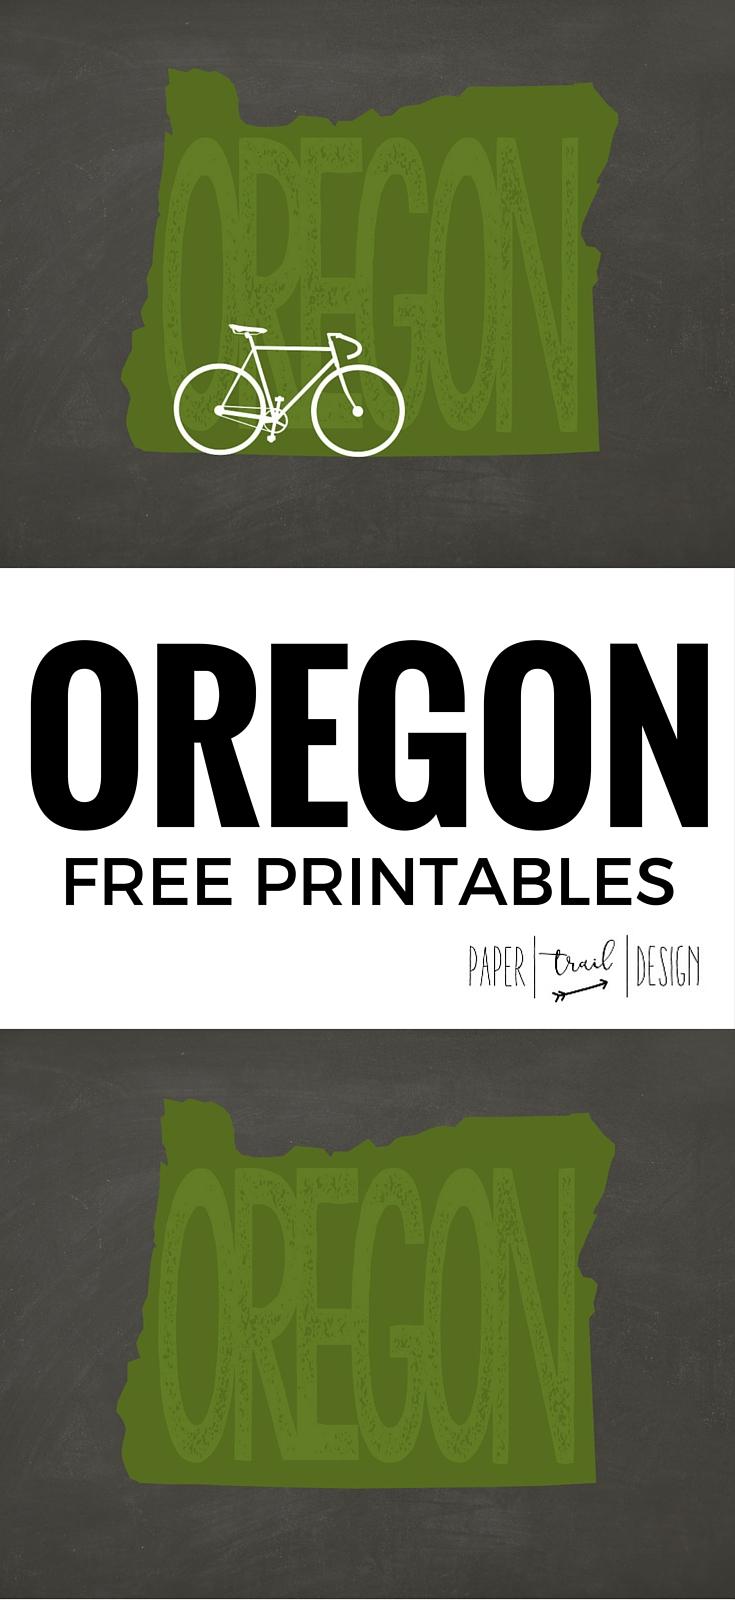 Oregon-bicycle-state-print-hiker